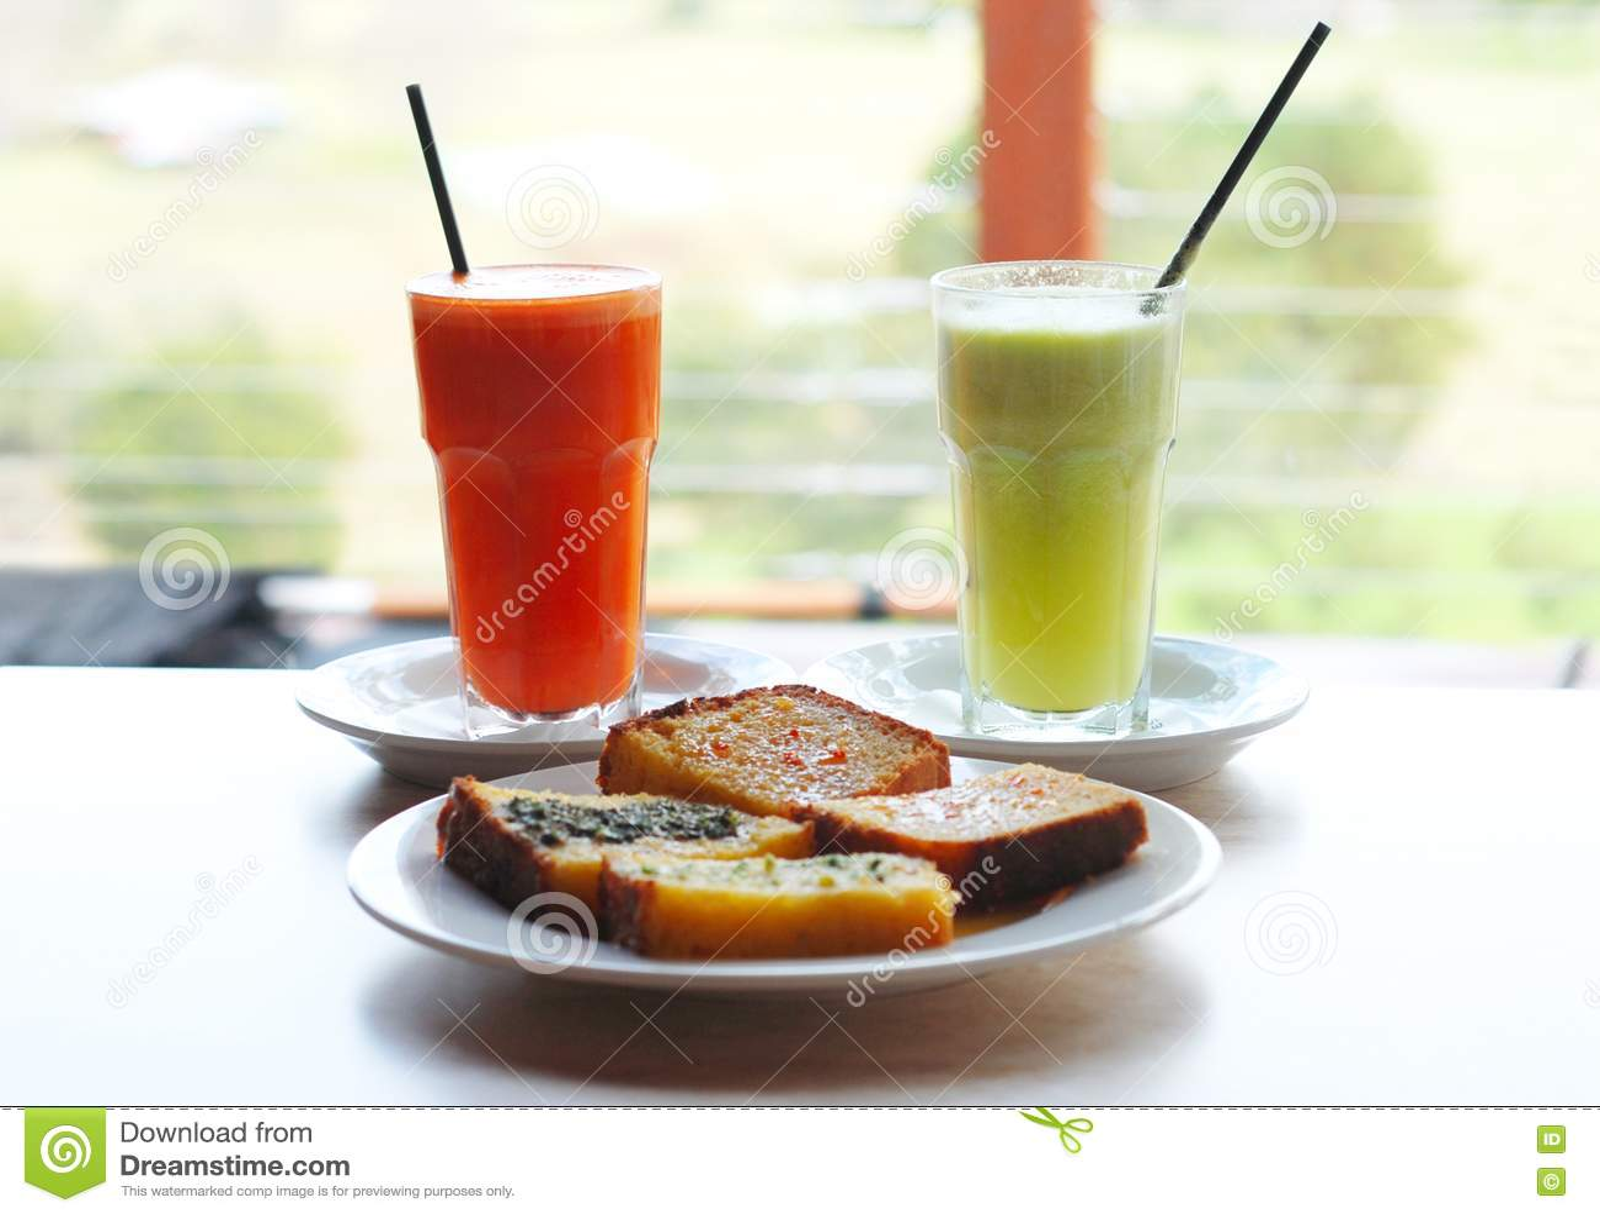 Vegetable Juice & Corn Bread